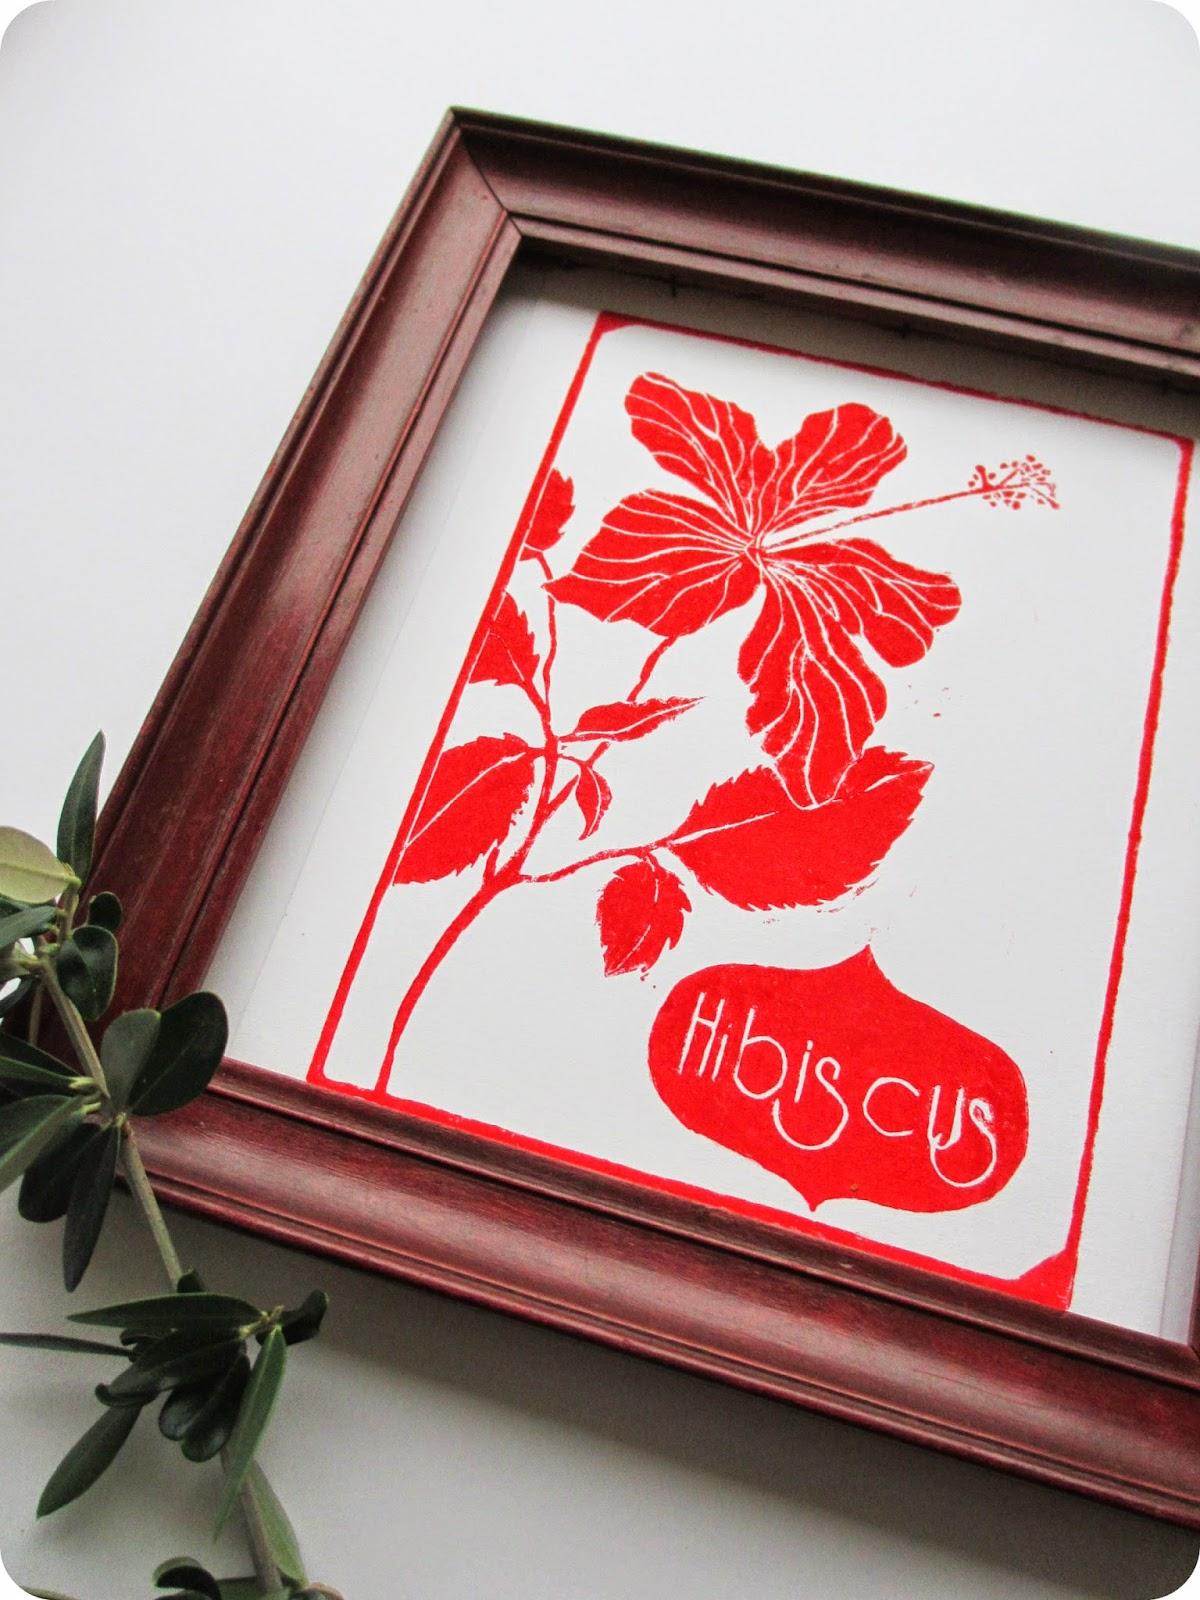 tadaam linogravure 1 hibiscus. Black Bedroom Furniture Sets. Home Design Ideas